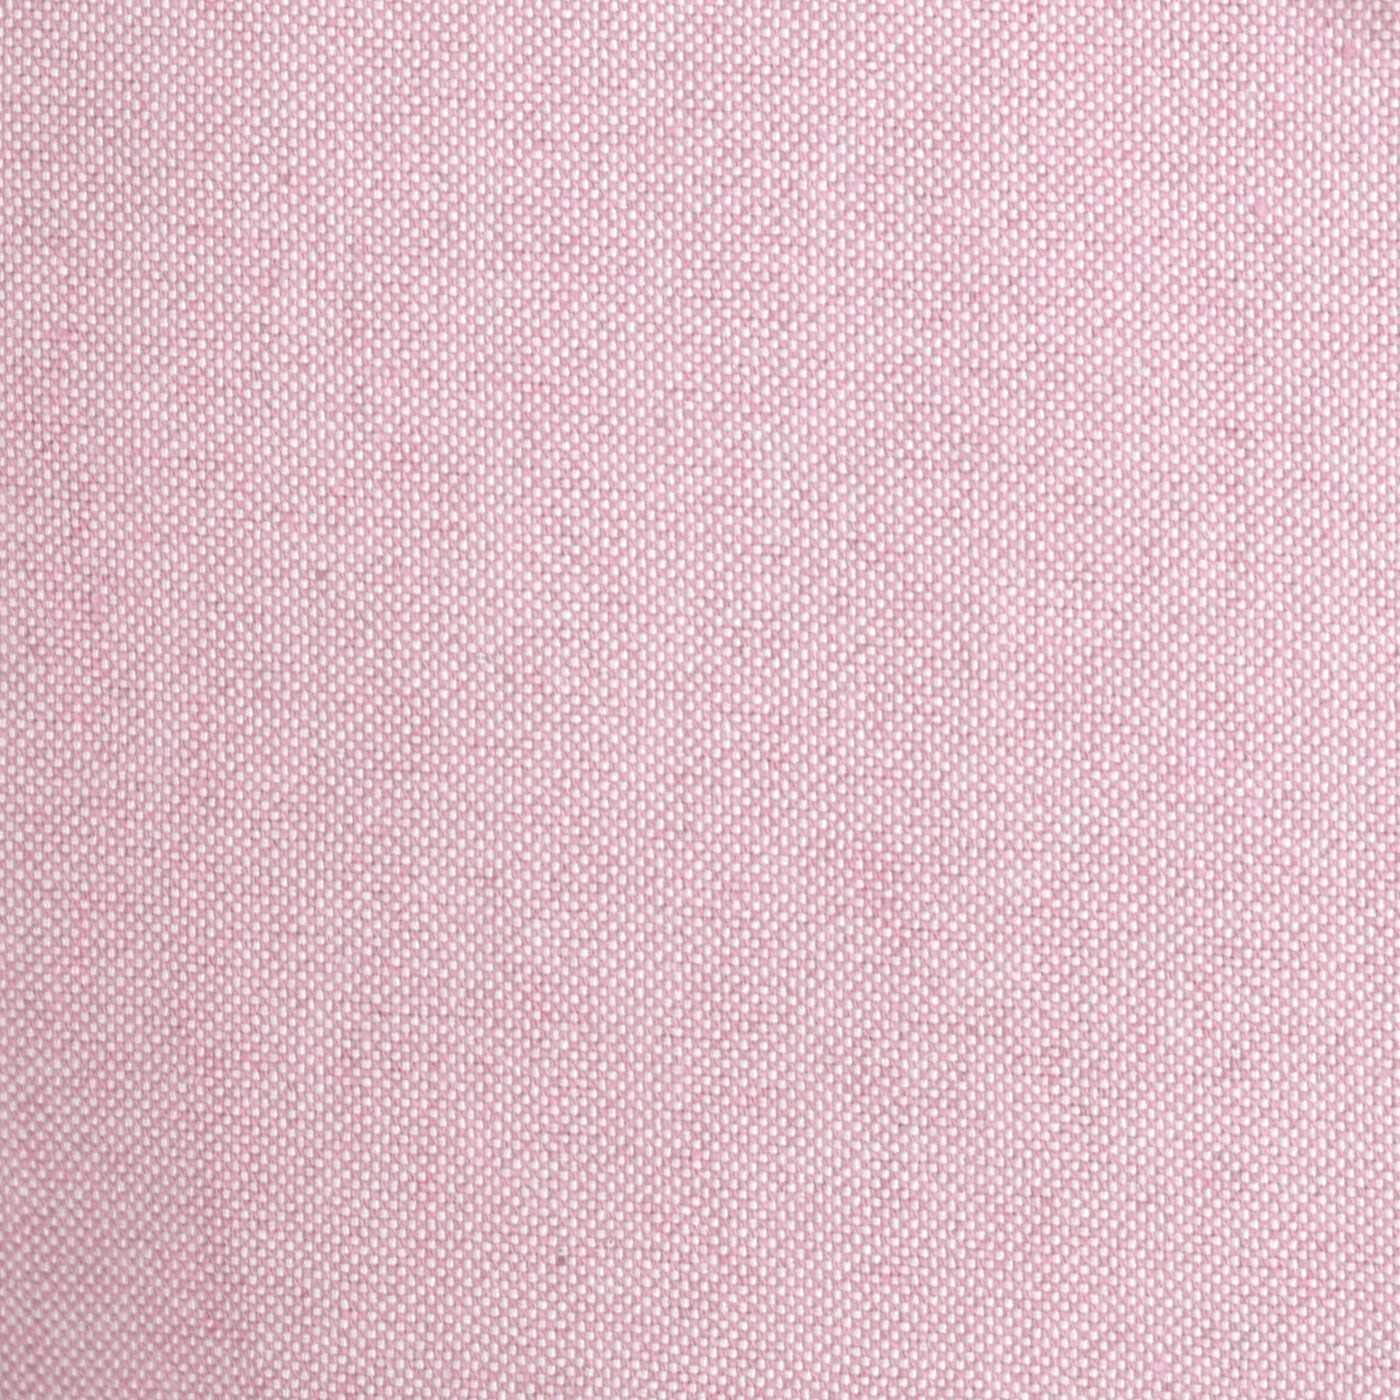 Innovaciones Roser Funda Cubre Sof/á Pr/áctica Modelo Kioto Color Azul 55cm Respaldo Medida 1 Plaza